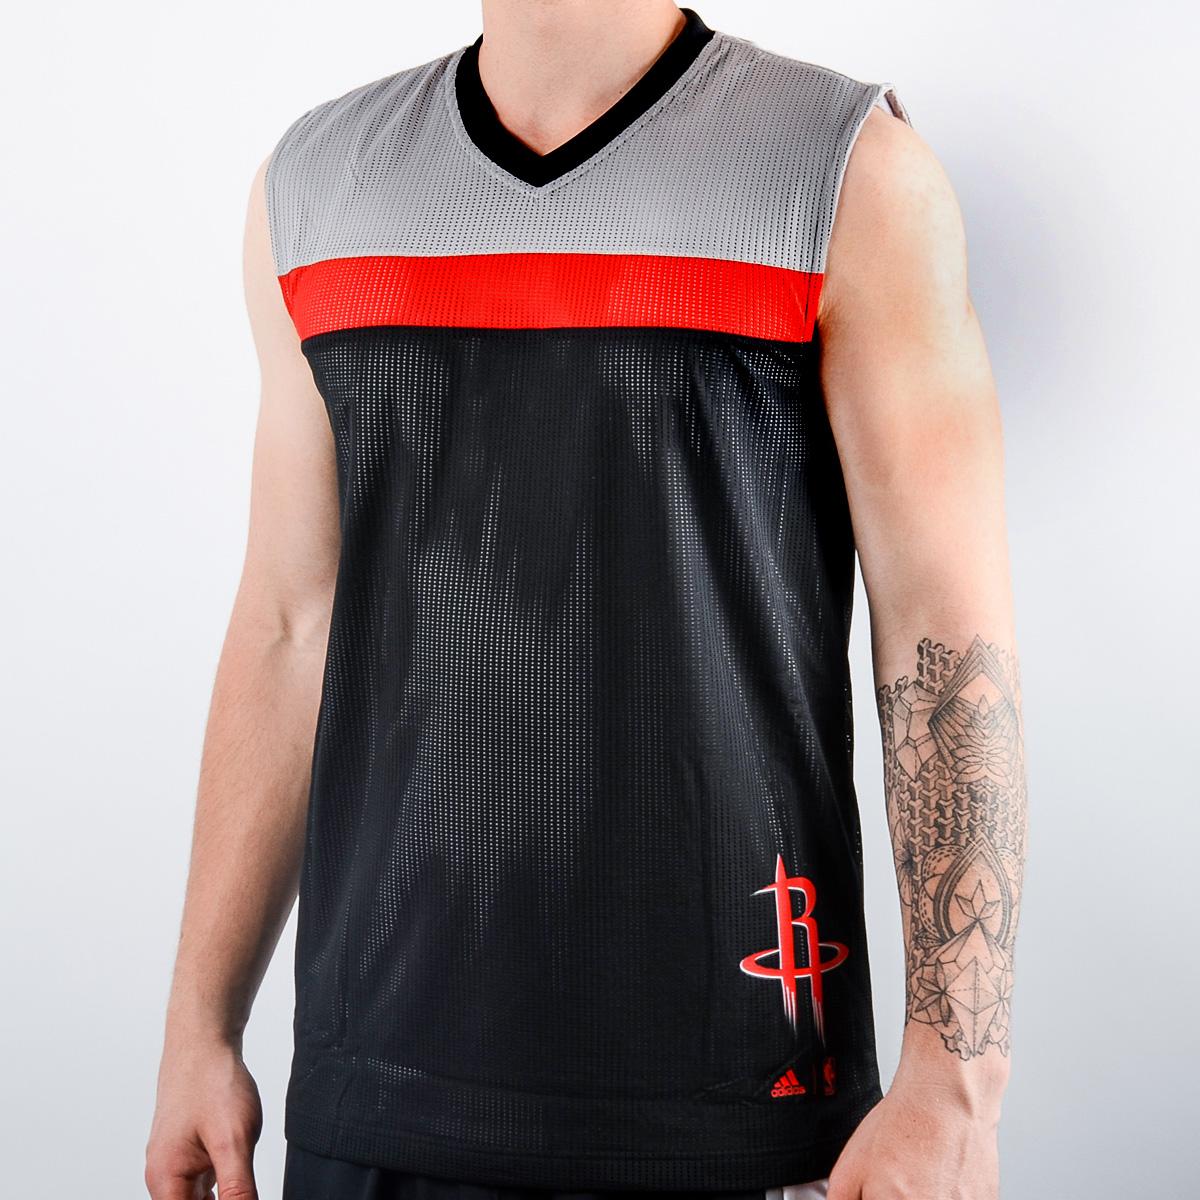 big sale 2309a d61d4 adidas NBA Houston Rockets Winter Hoops reversible jersey ...